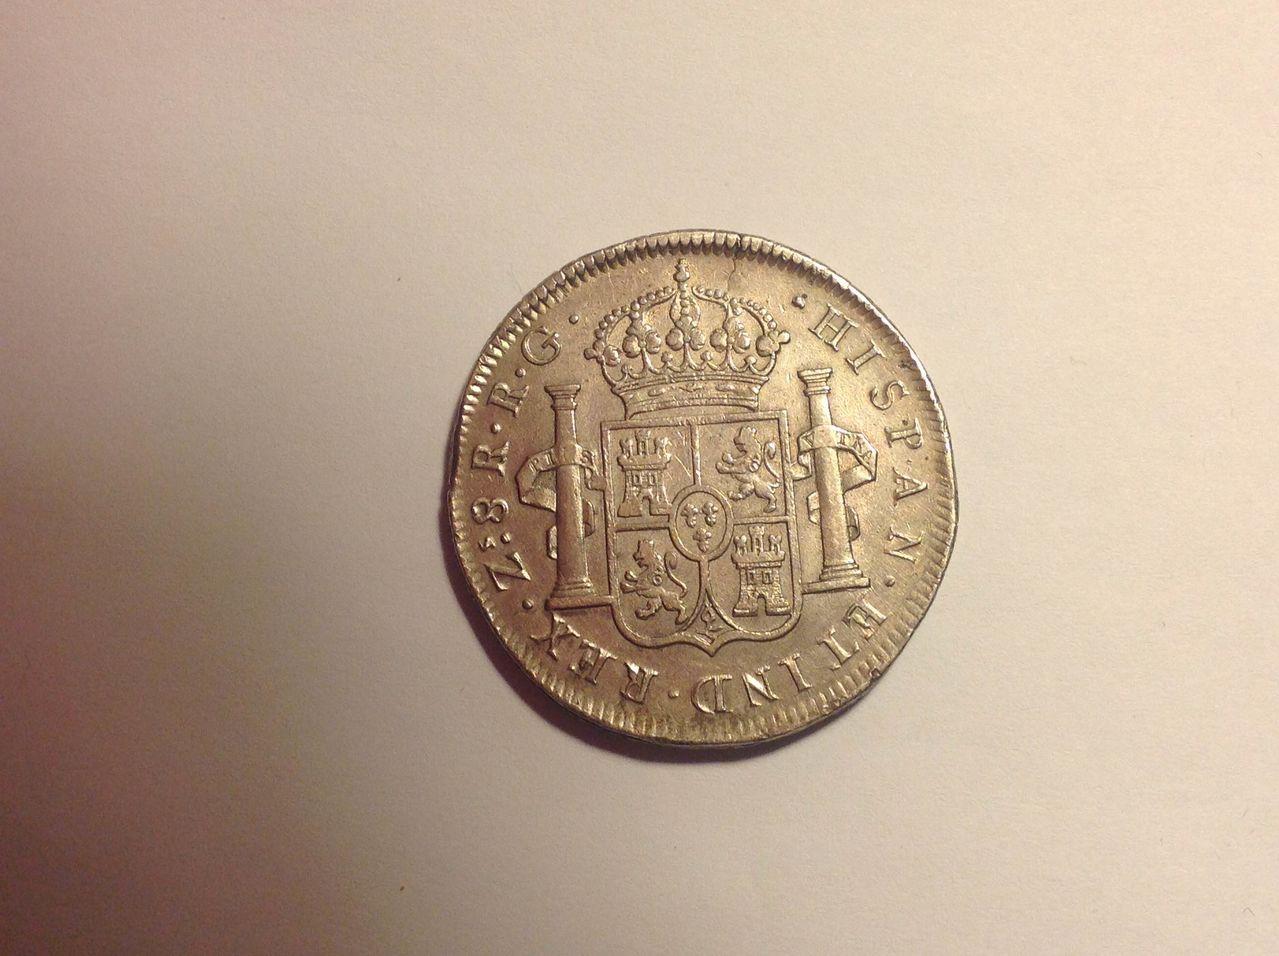 8 reales, Zacatecas, 1820 - RG - FERNANDO VII  IMG_0187